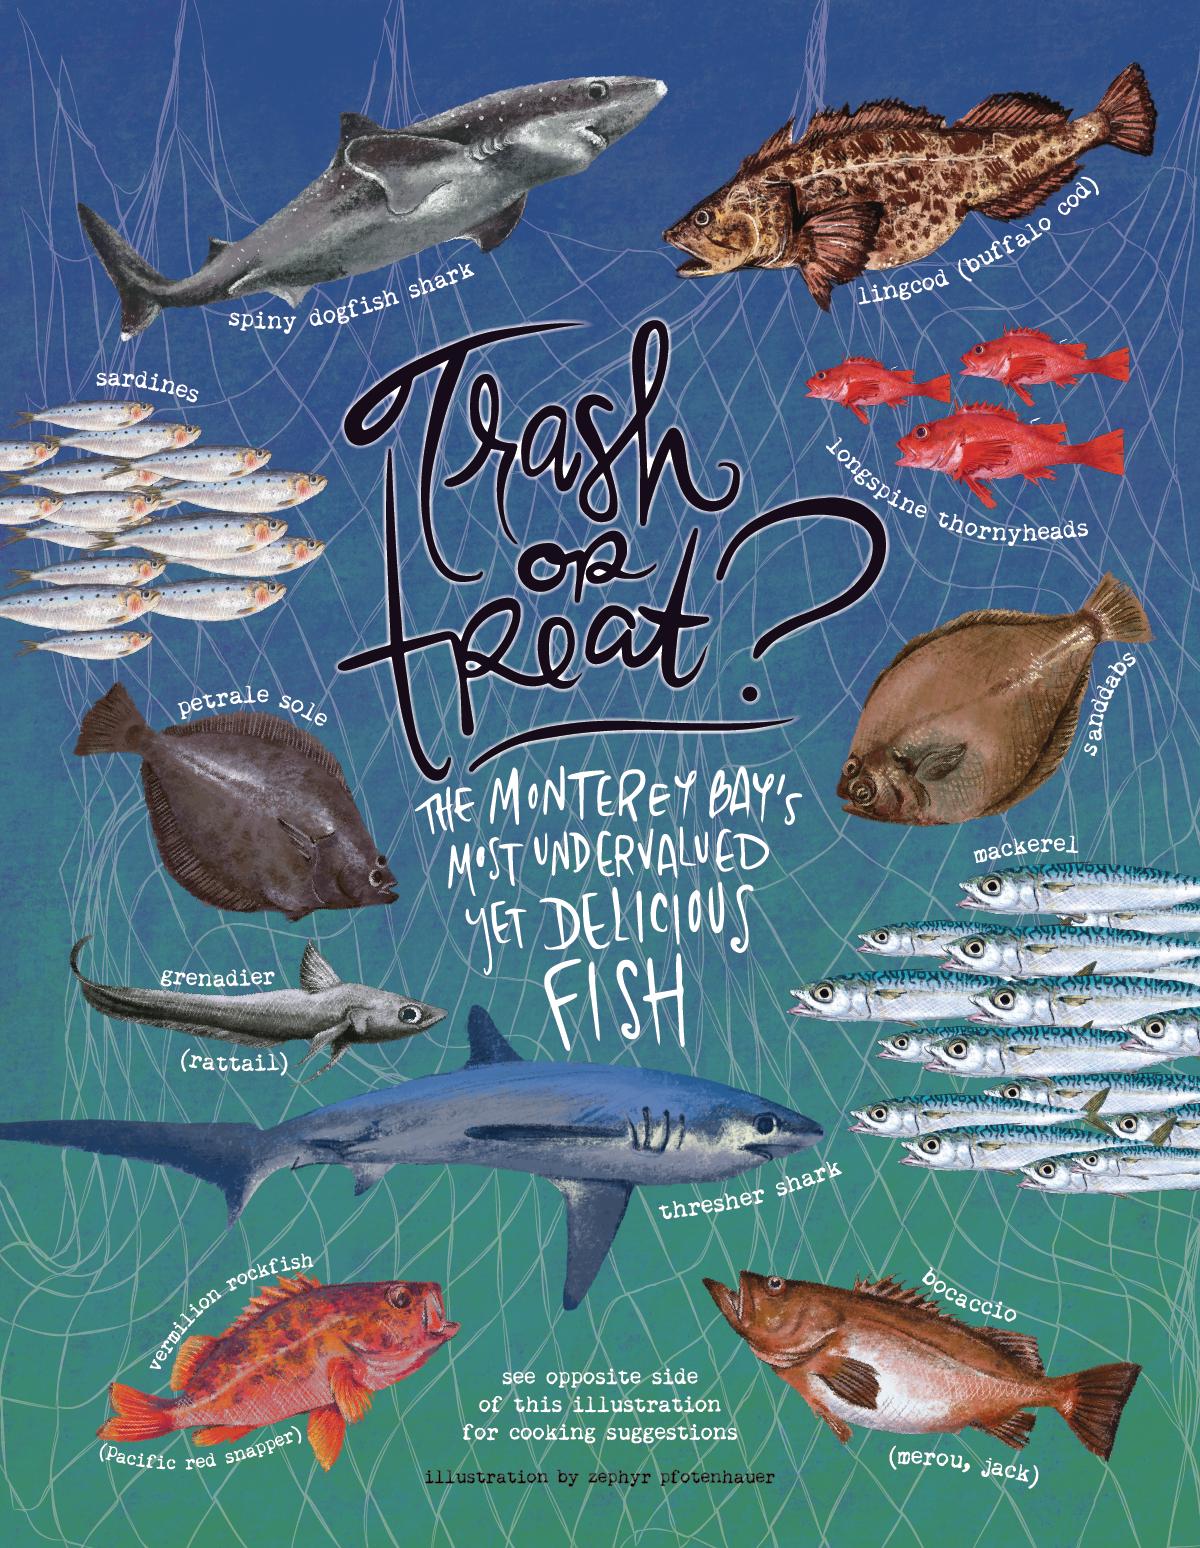 trash fish guide